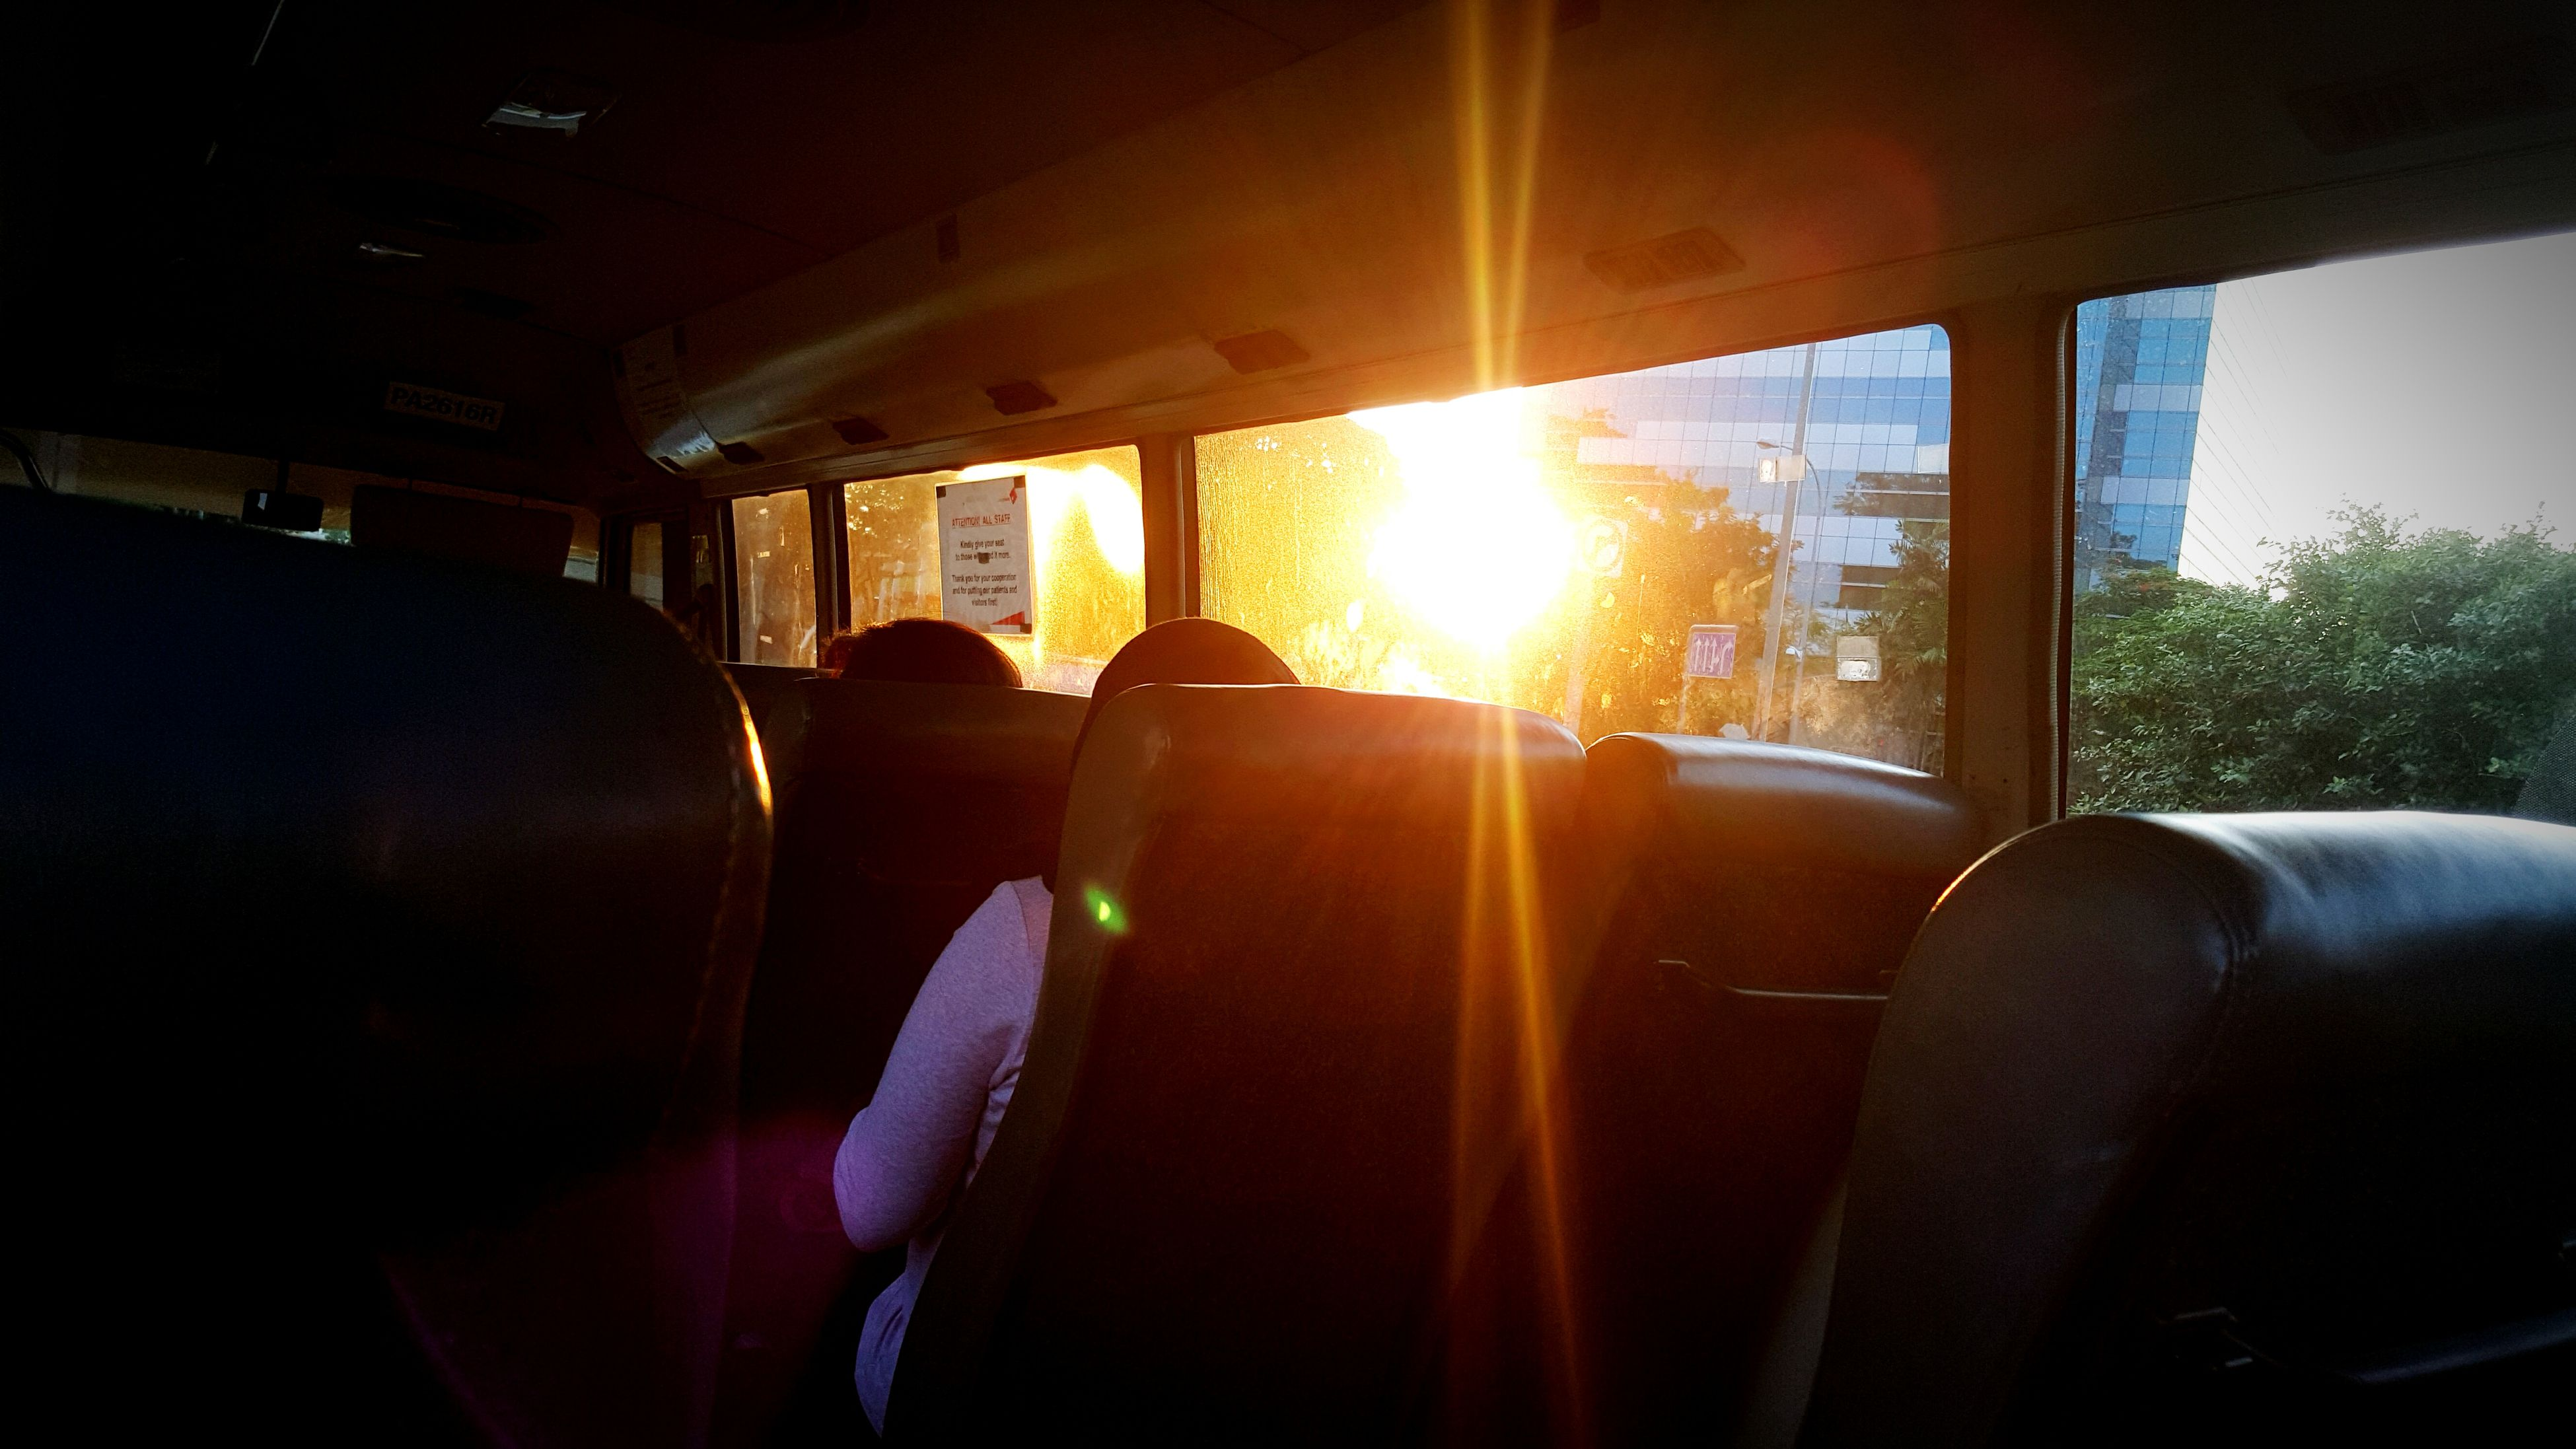 sun, sunbeam, sunlight, transportation, lens flare, sunset, vehicle interior, mode of transport, car, window, land vehicle, glass - material, indoors, travel, sky, bright, transparent, vehicle seat, sunny, silhouette